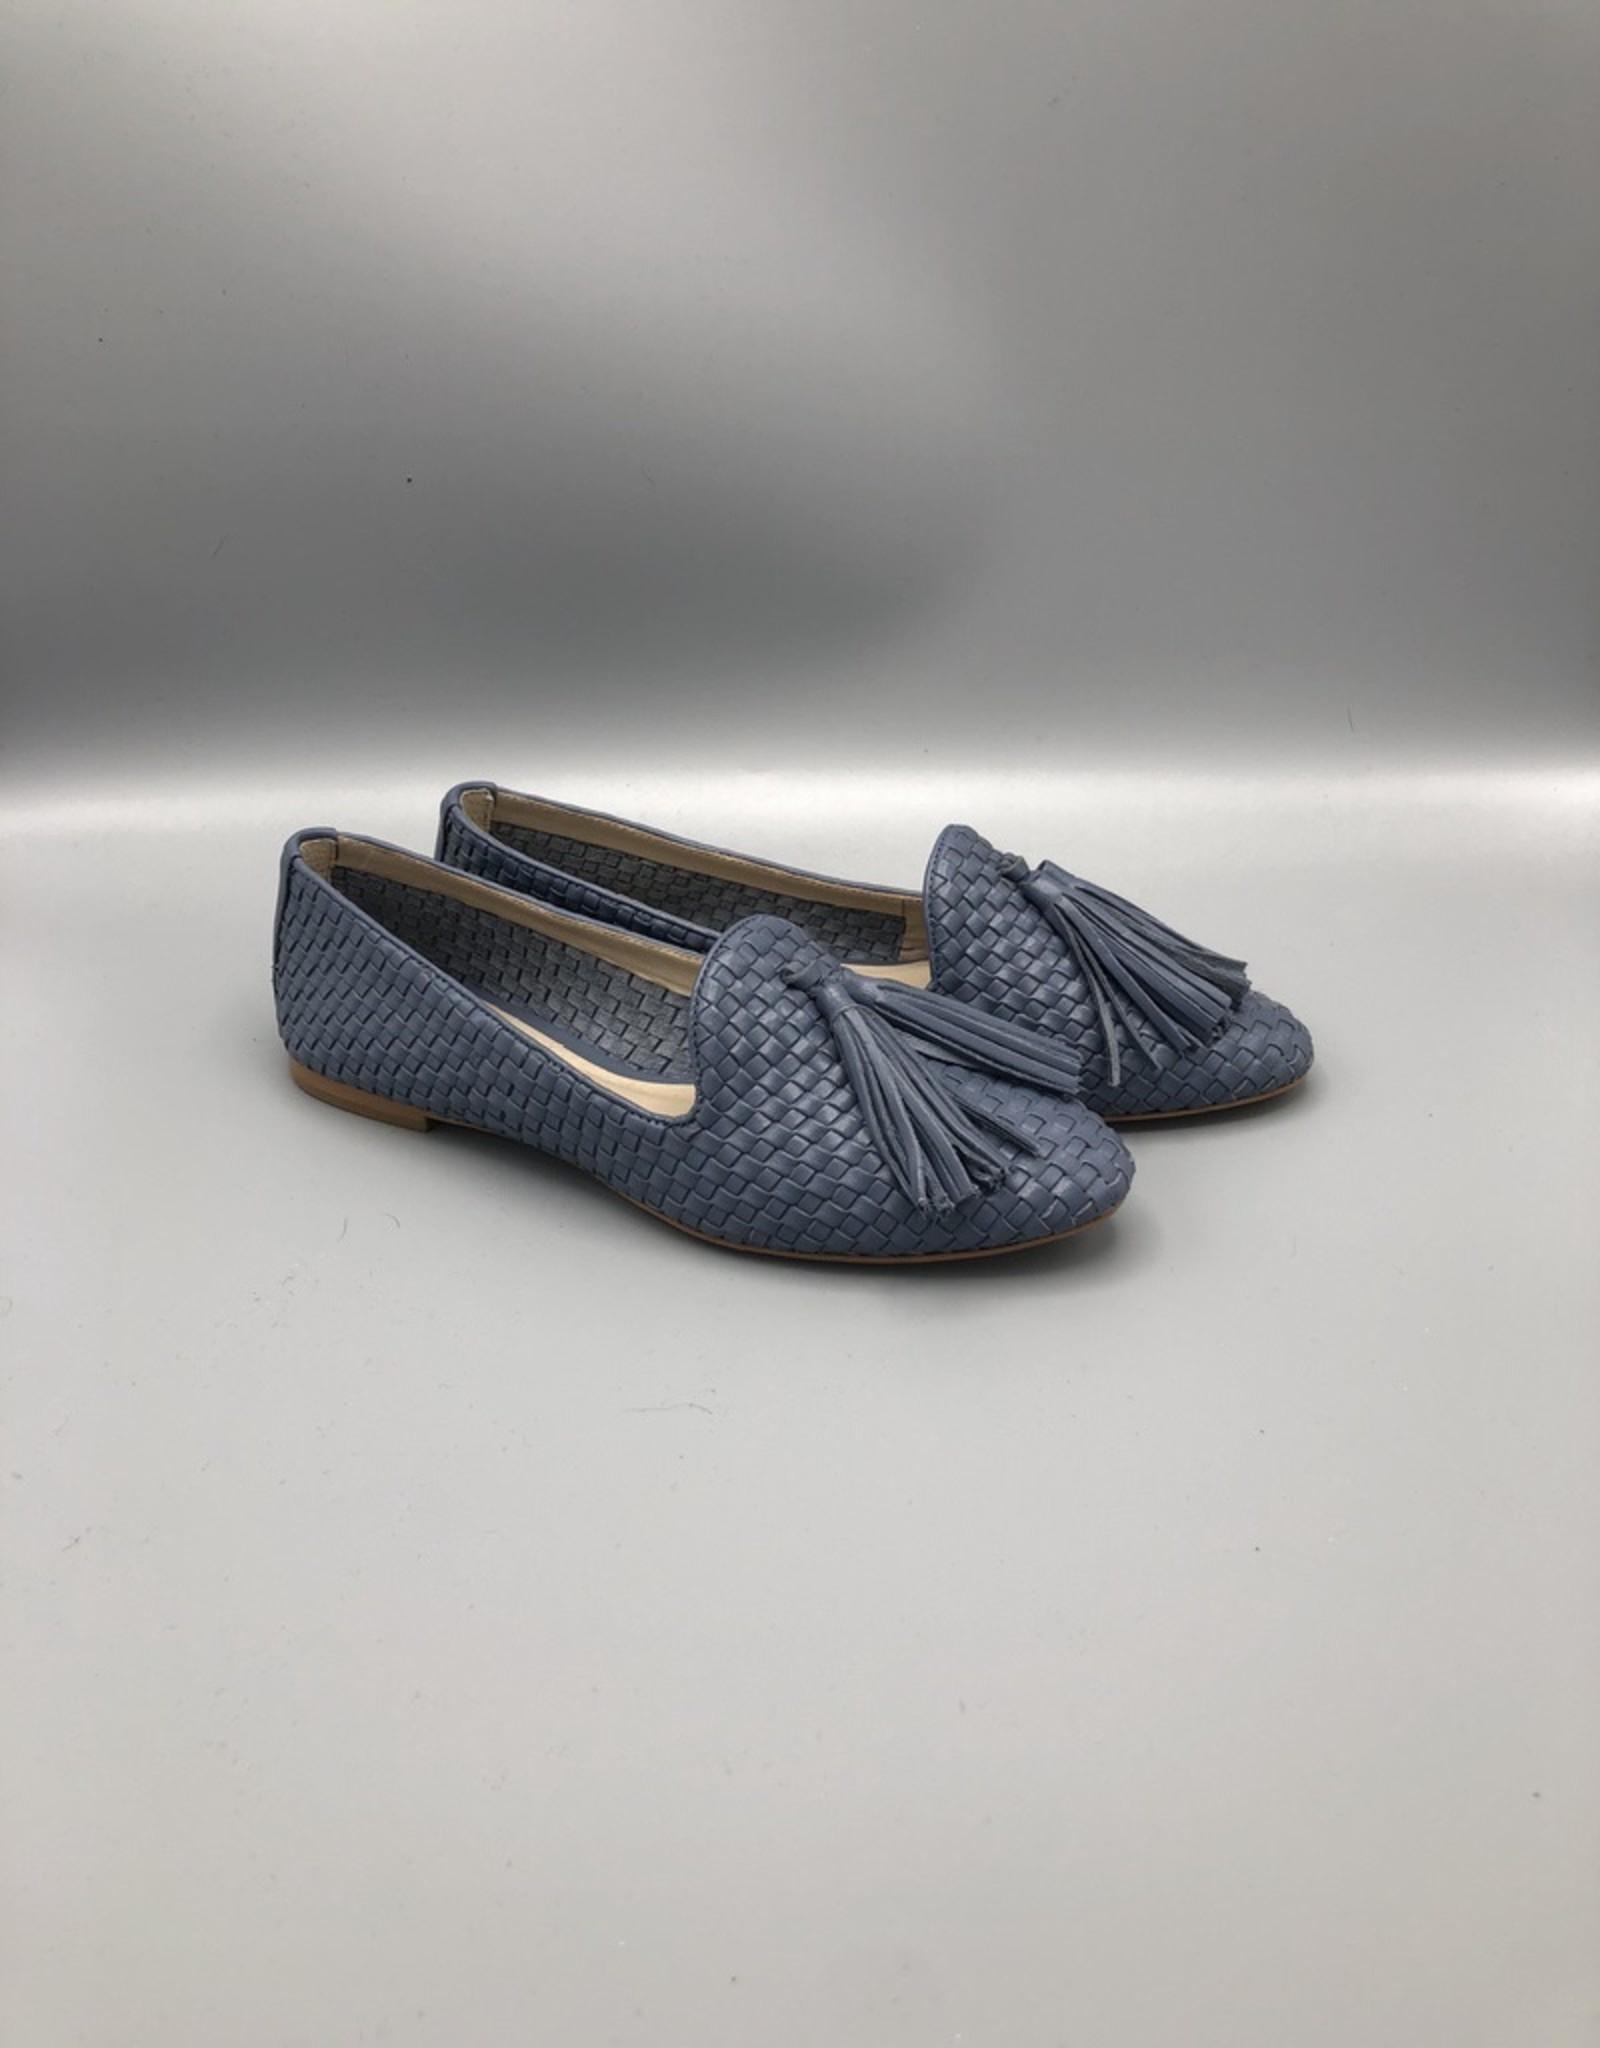 Guilhermina Tassle Braided Leather Loafer